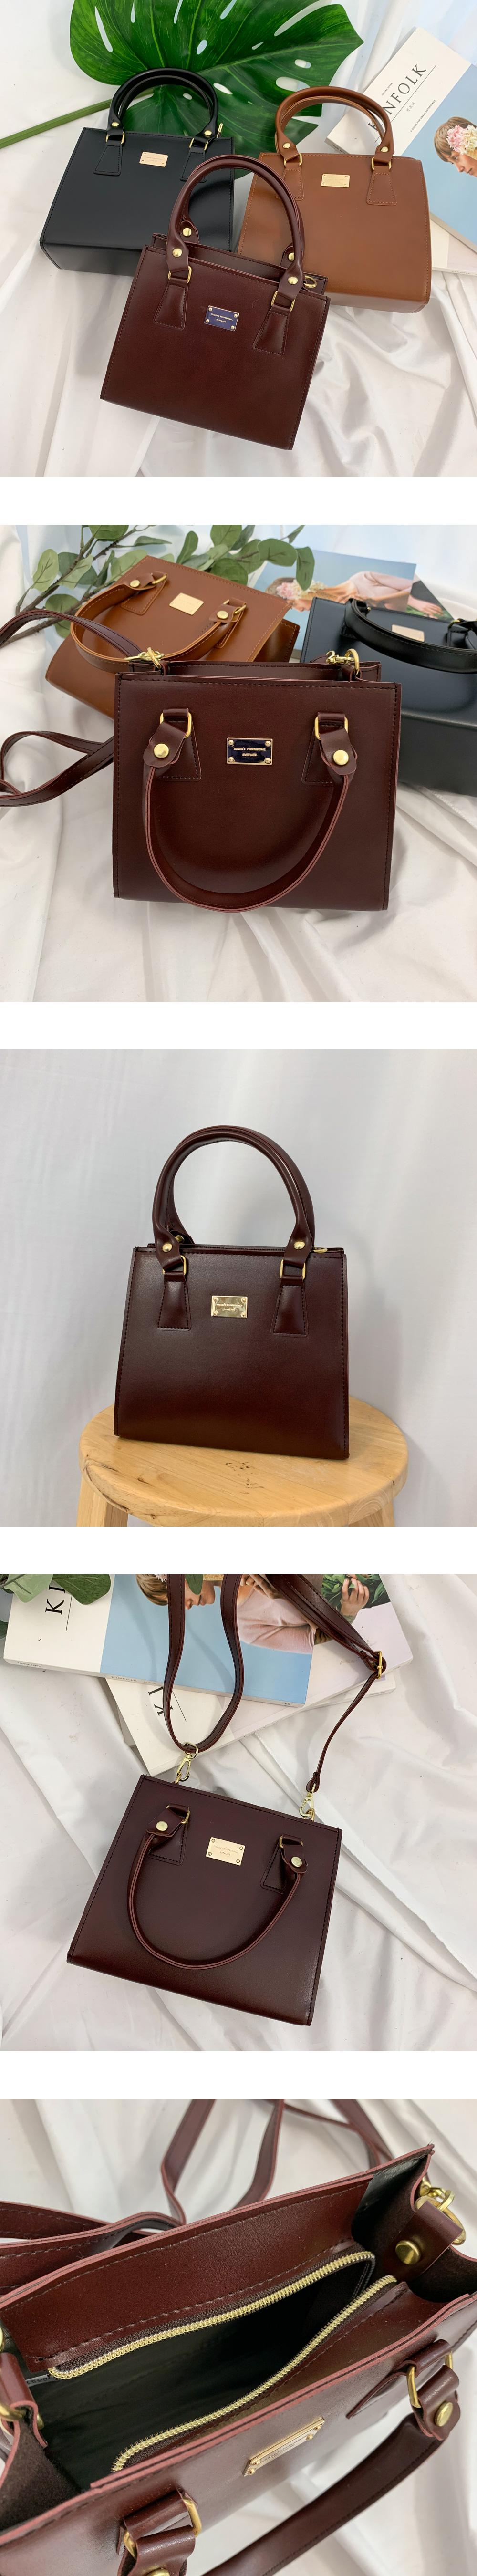 1099 Clark Tod X Shoulder Bag